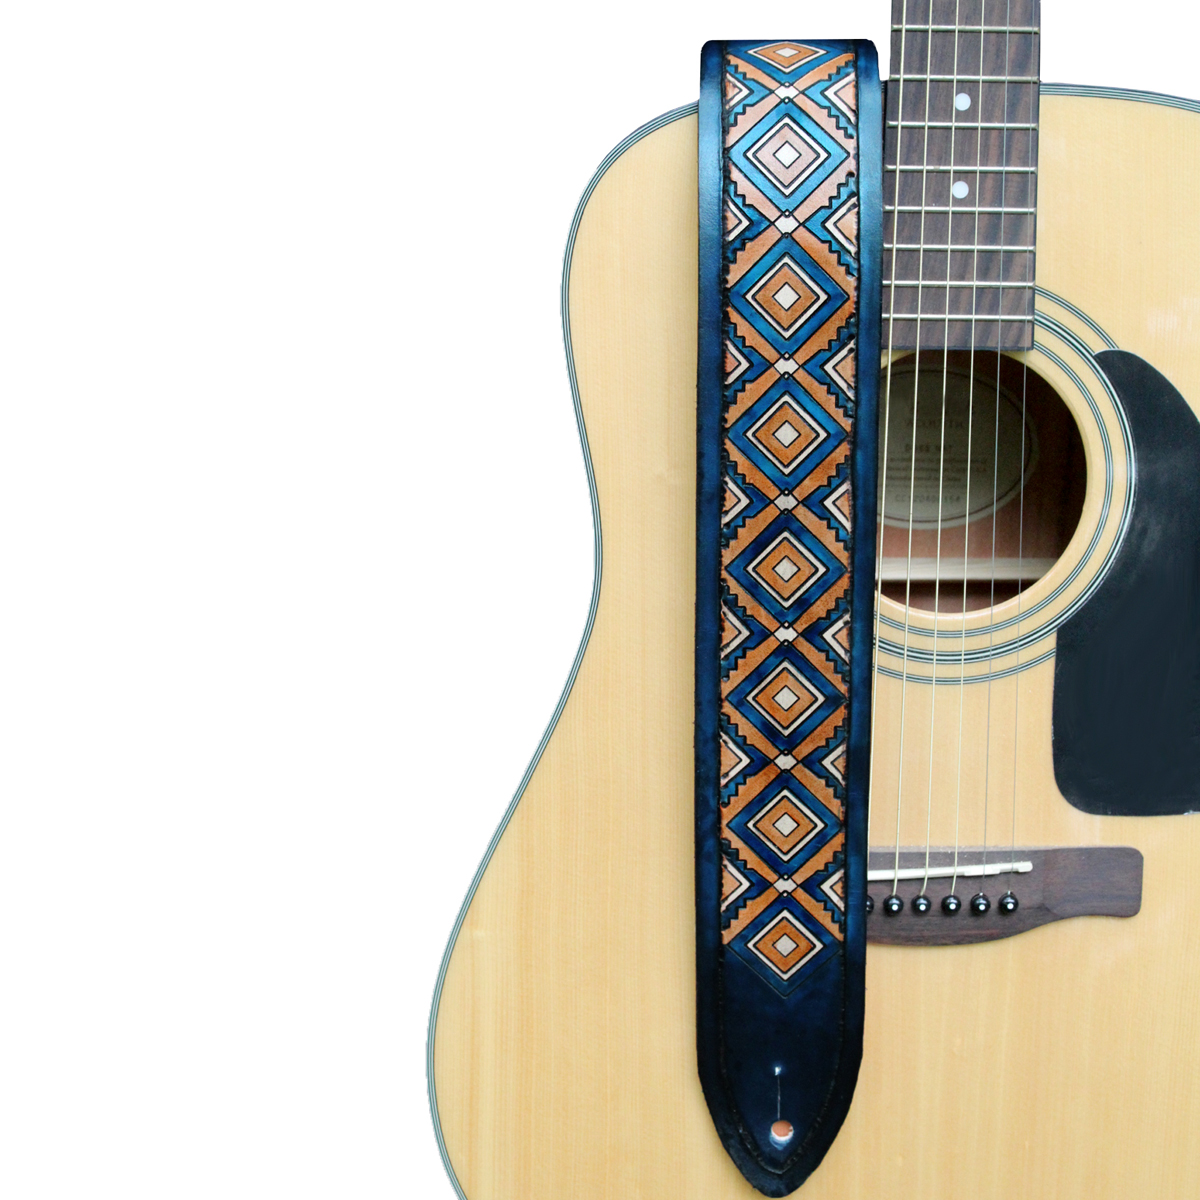 blue-diamondback-leather-guitar-strap-the-leather-smithy-WEB